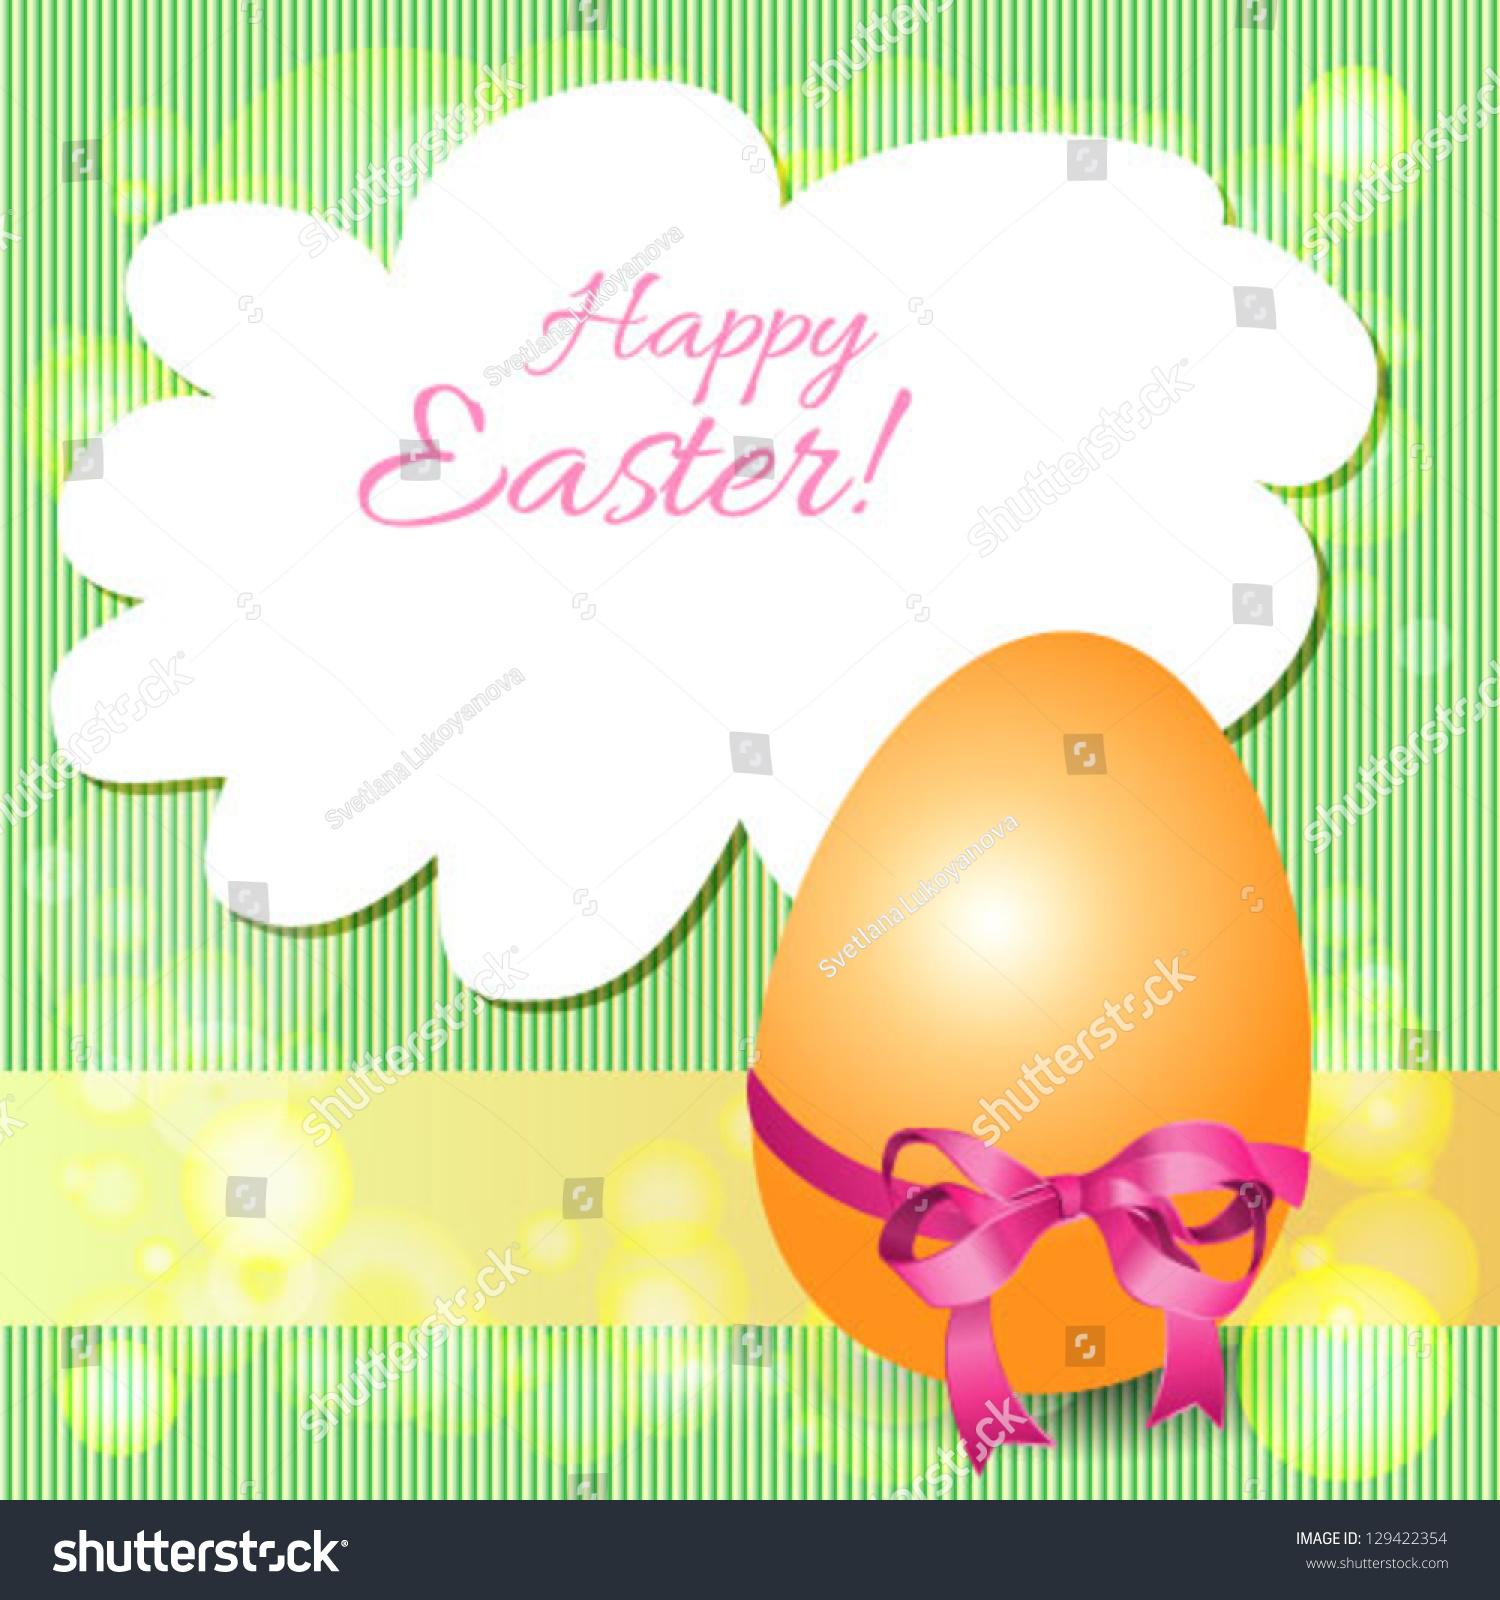 easter egg from easter cardampbanner vector background